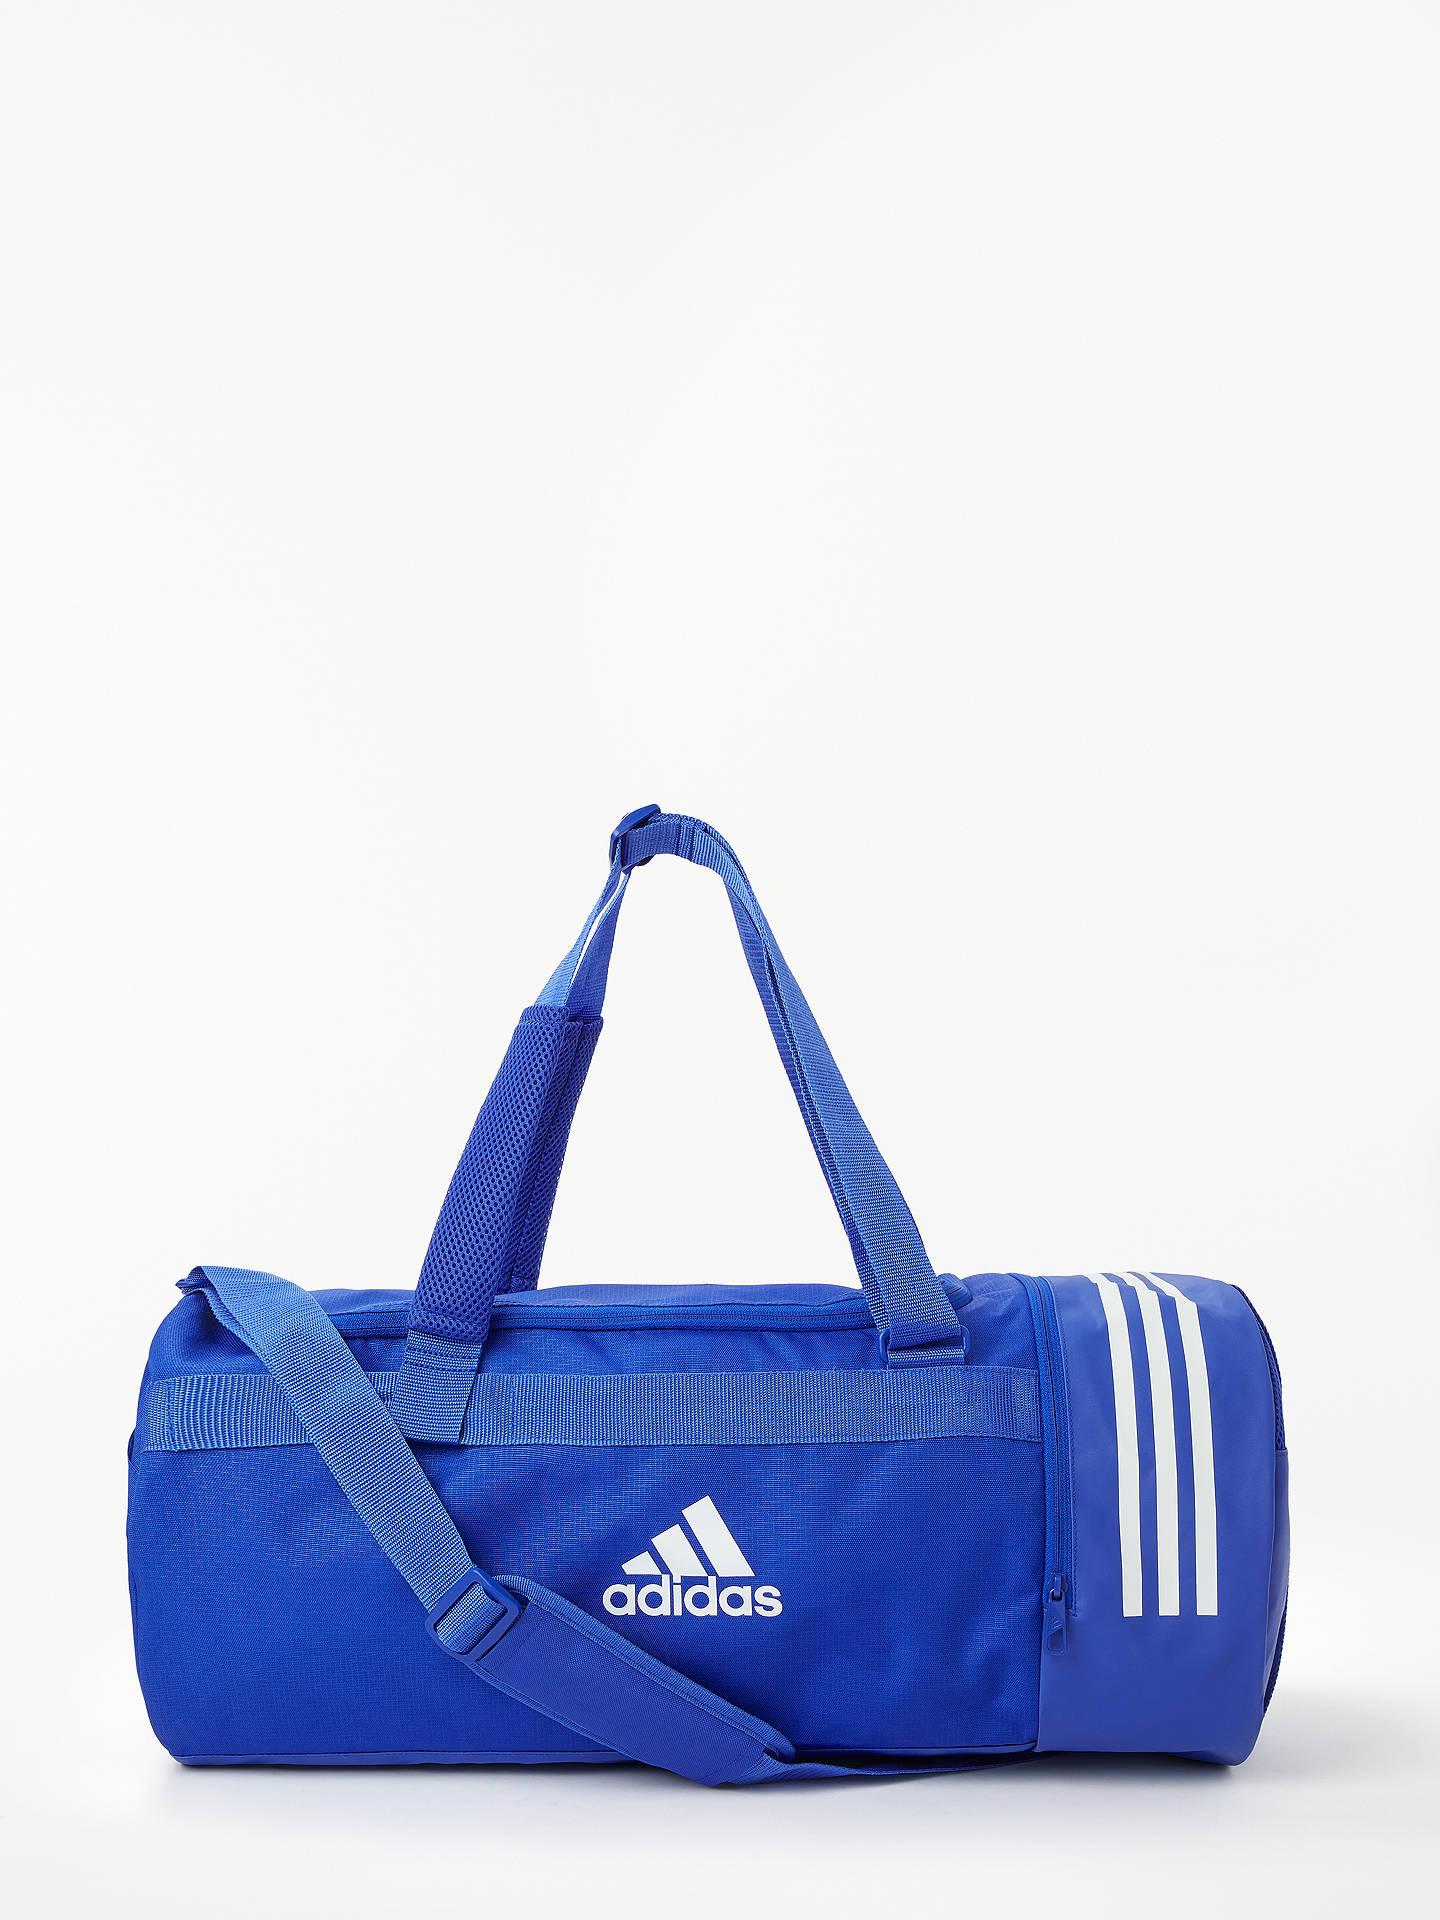 8aa408a0071f Buyadidas Convertible 3-Stripes Duffle Bag